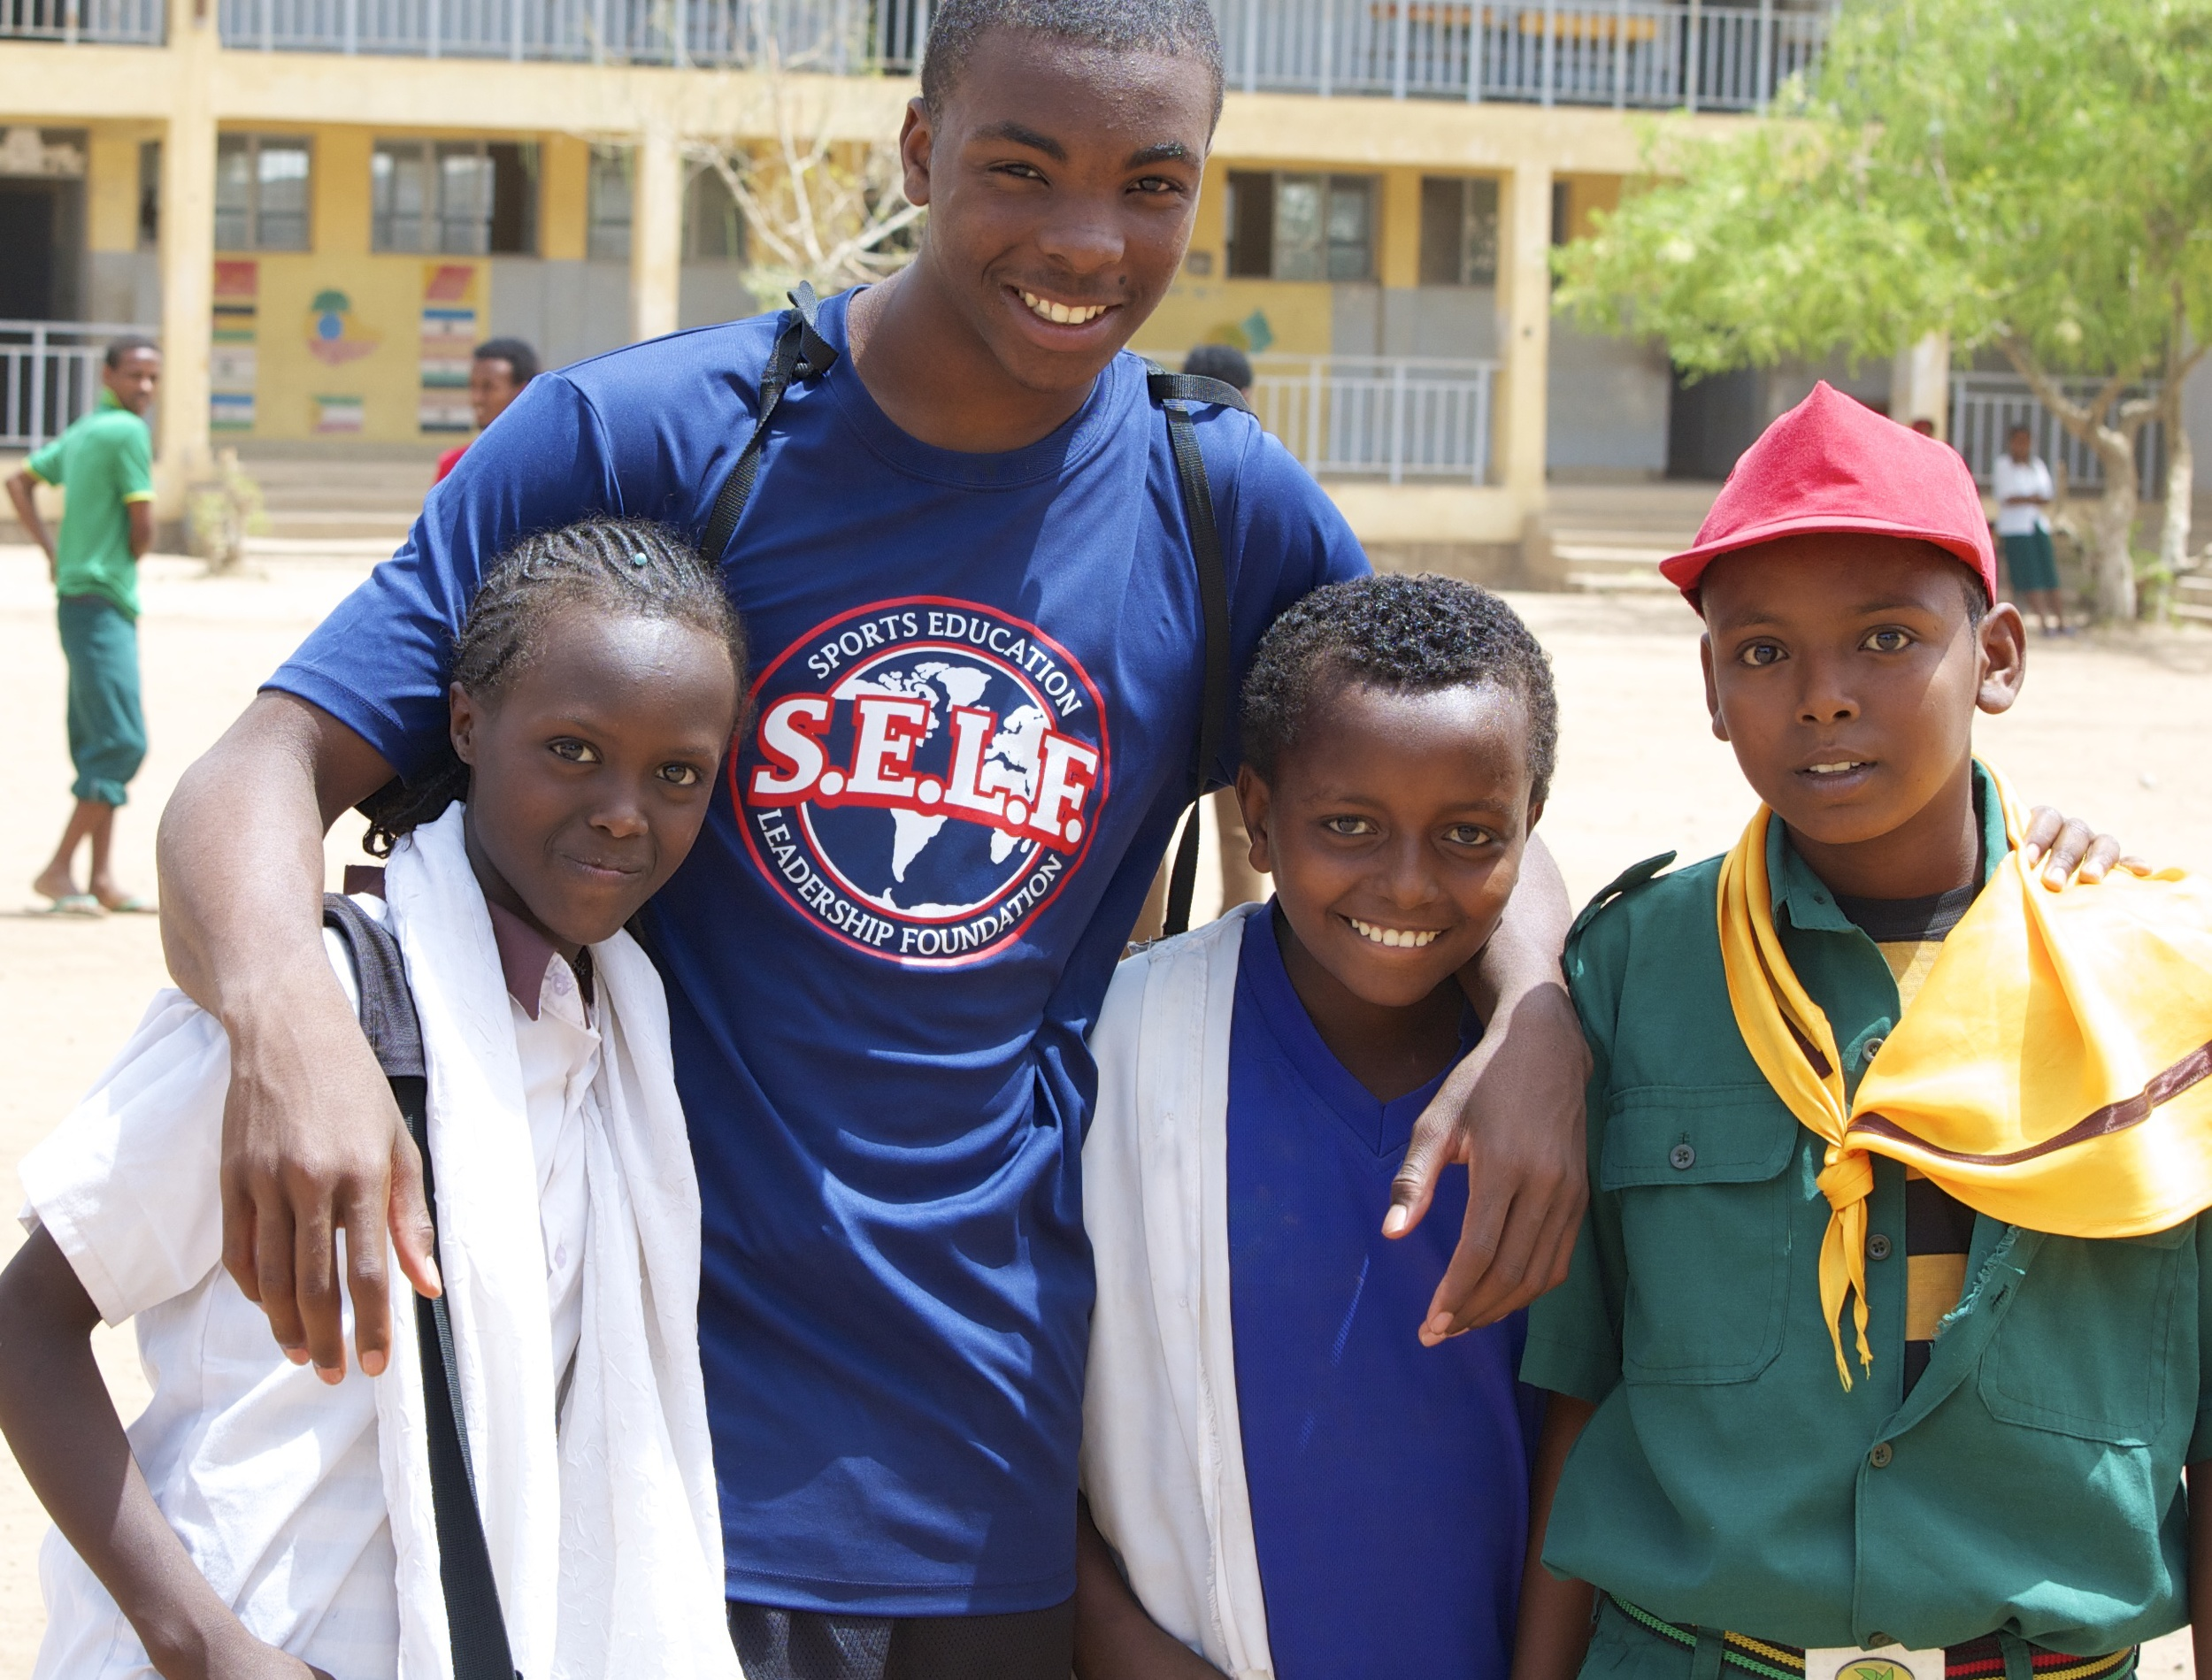 Faizon and school kids